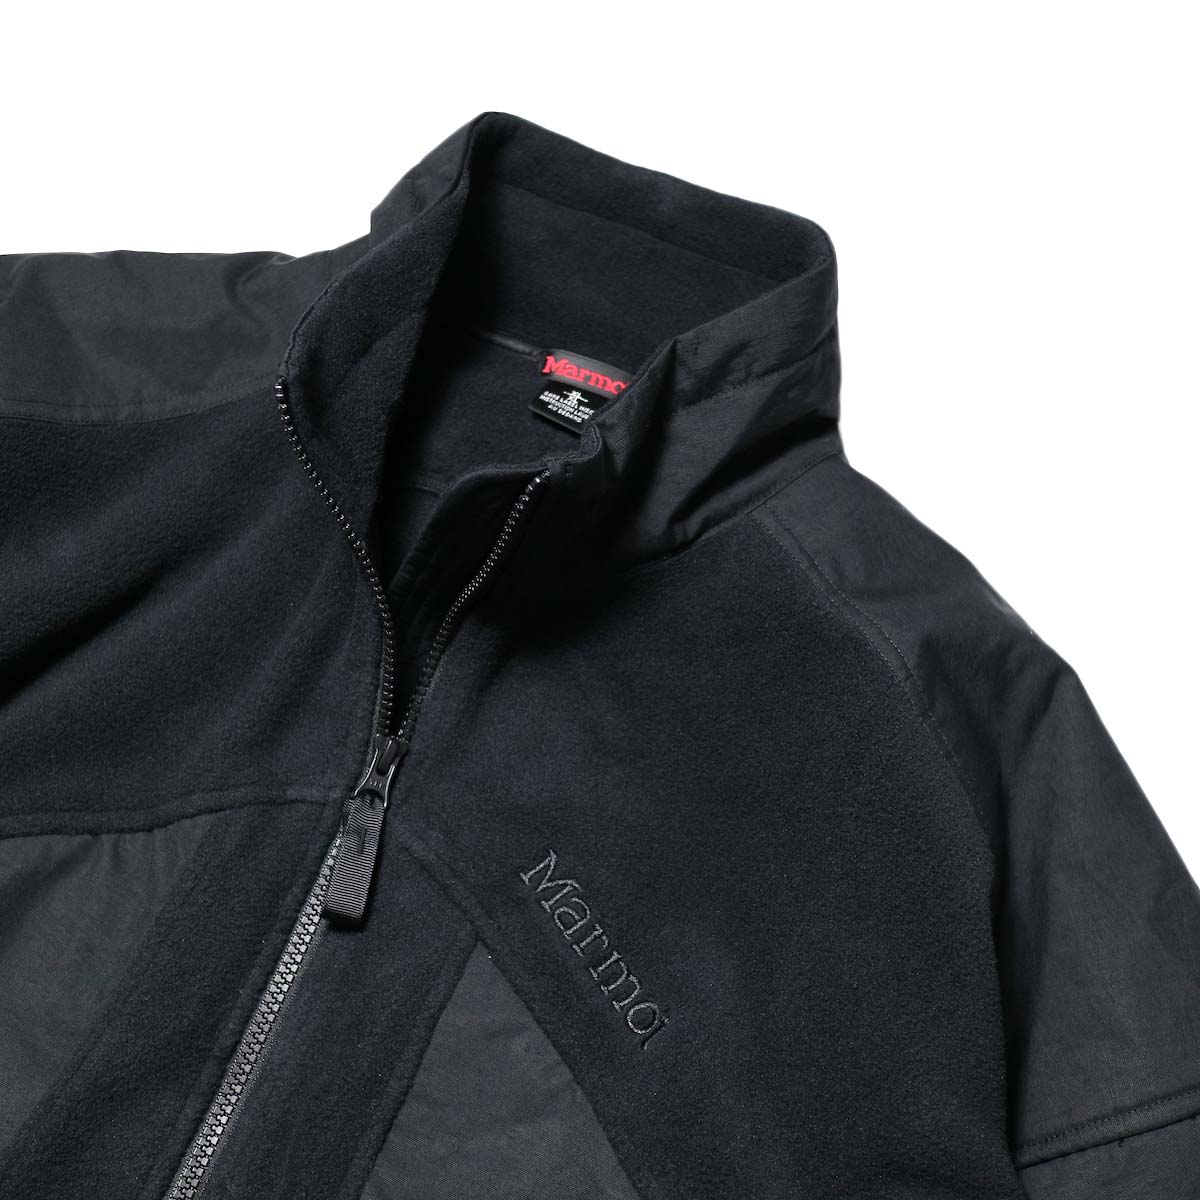 Marmot Histric Collection / Alpinist Tech Sweater (Black×Black)襟